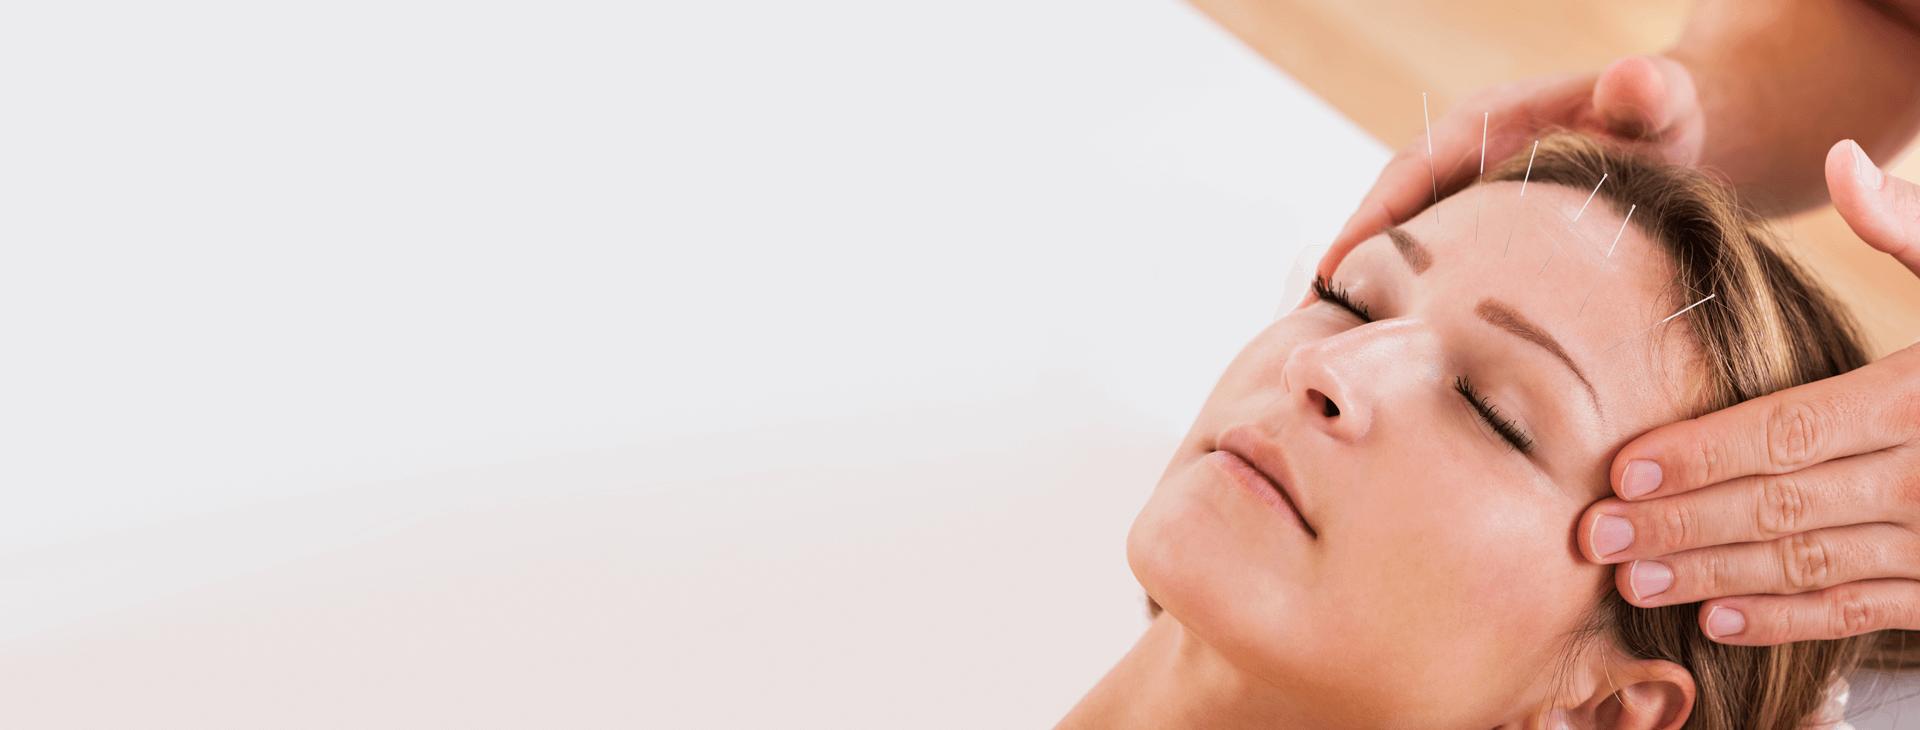 headerbild-akupunktur